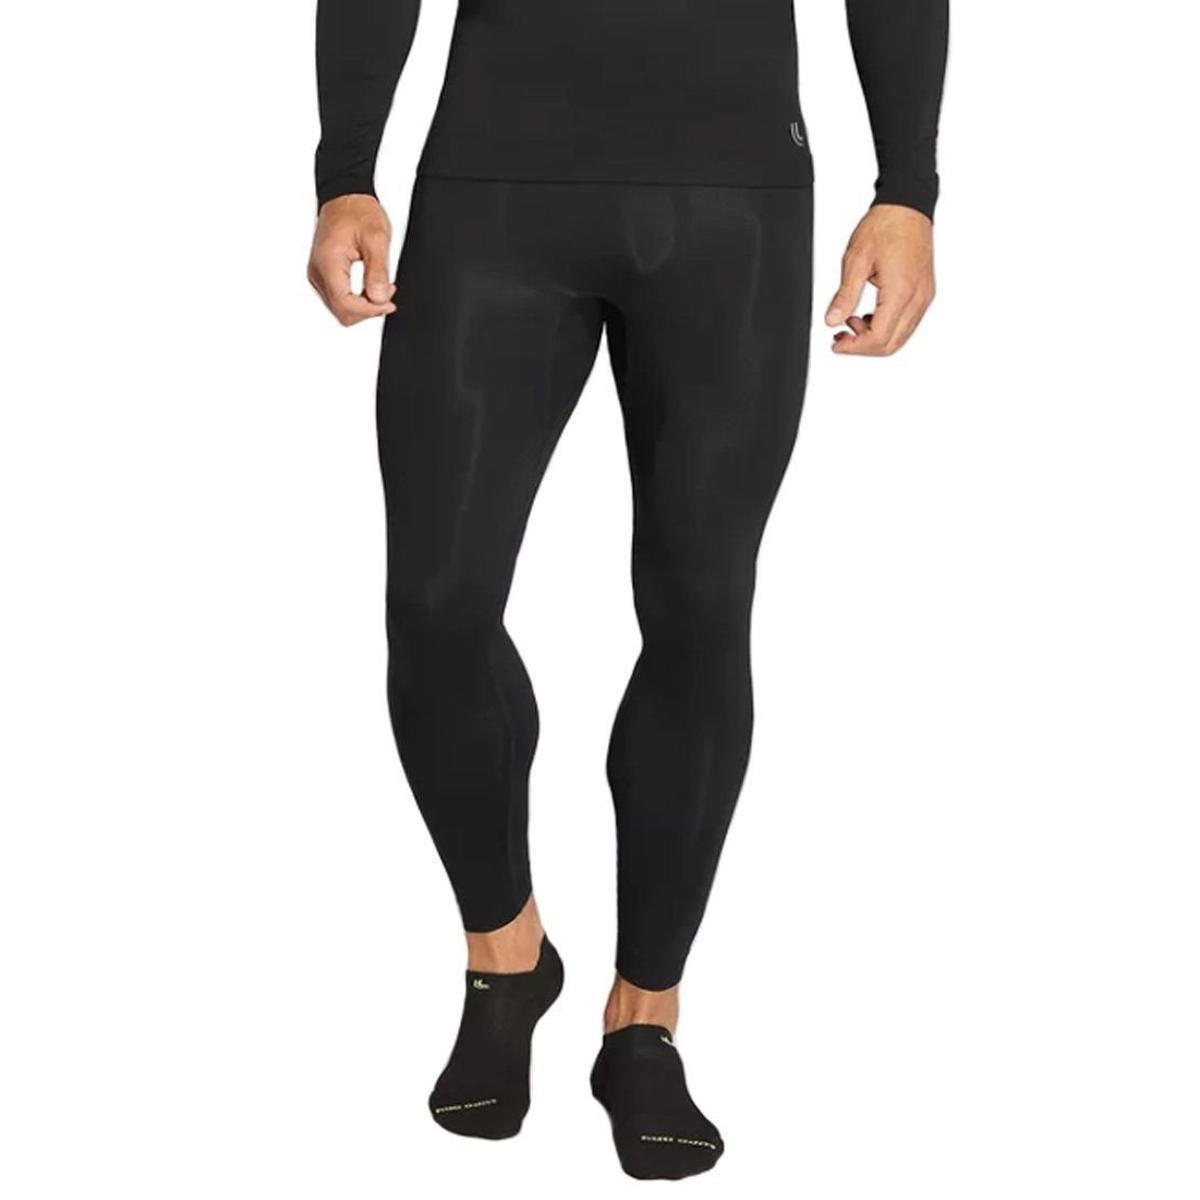 Calça Lupo Legging Masculino Underwear Warm